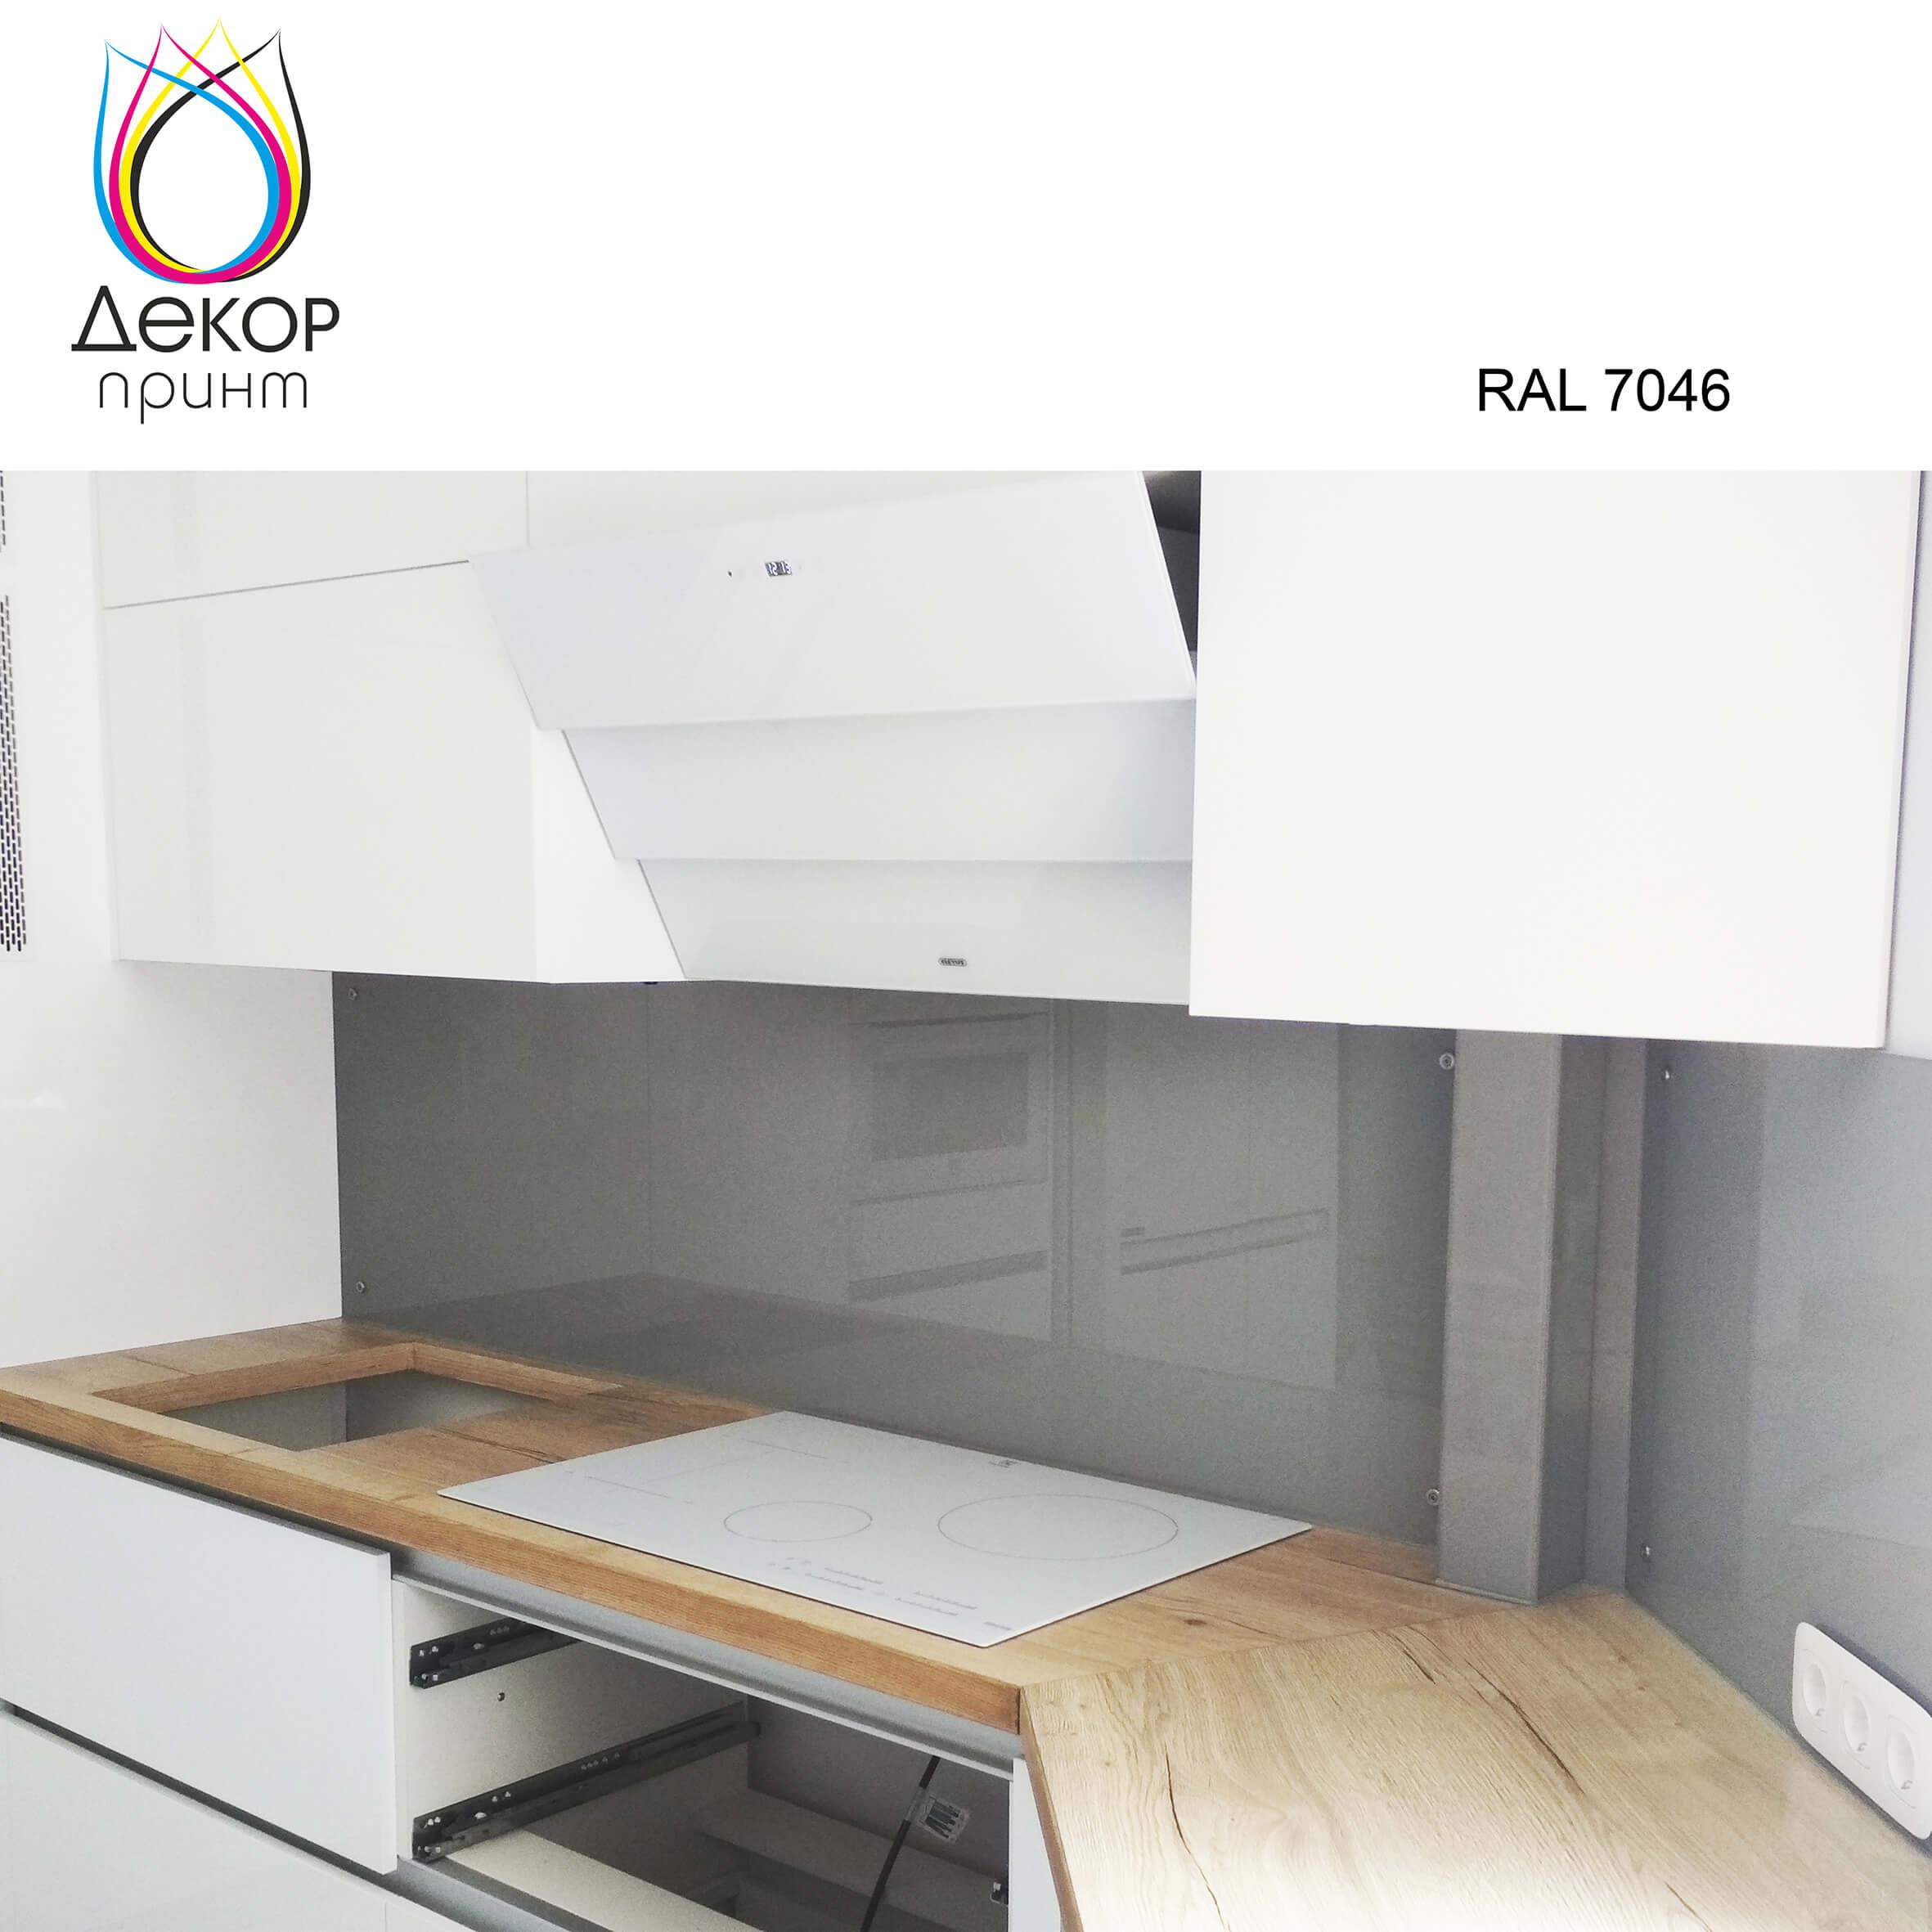 Galereya-robit-244